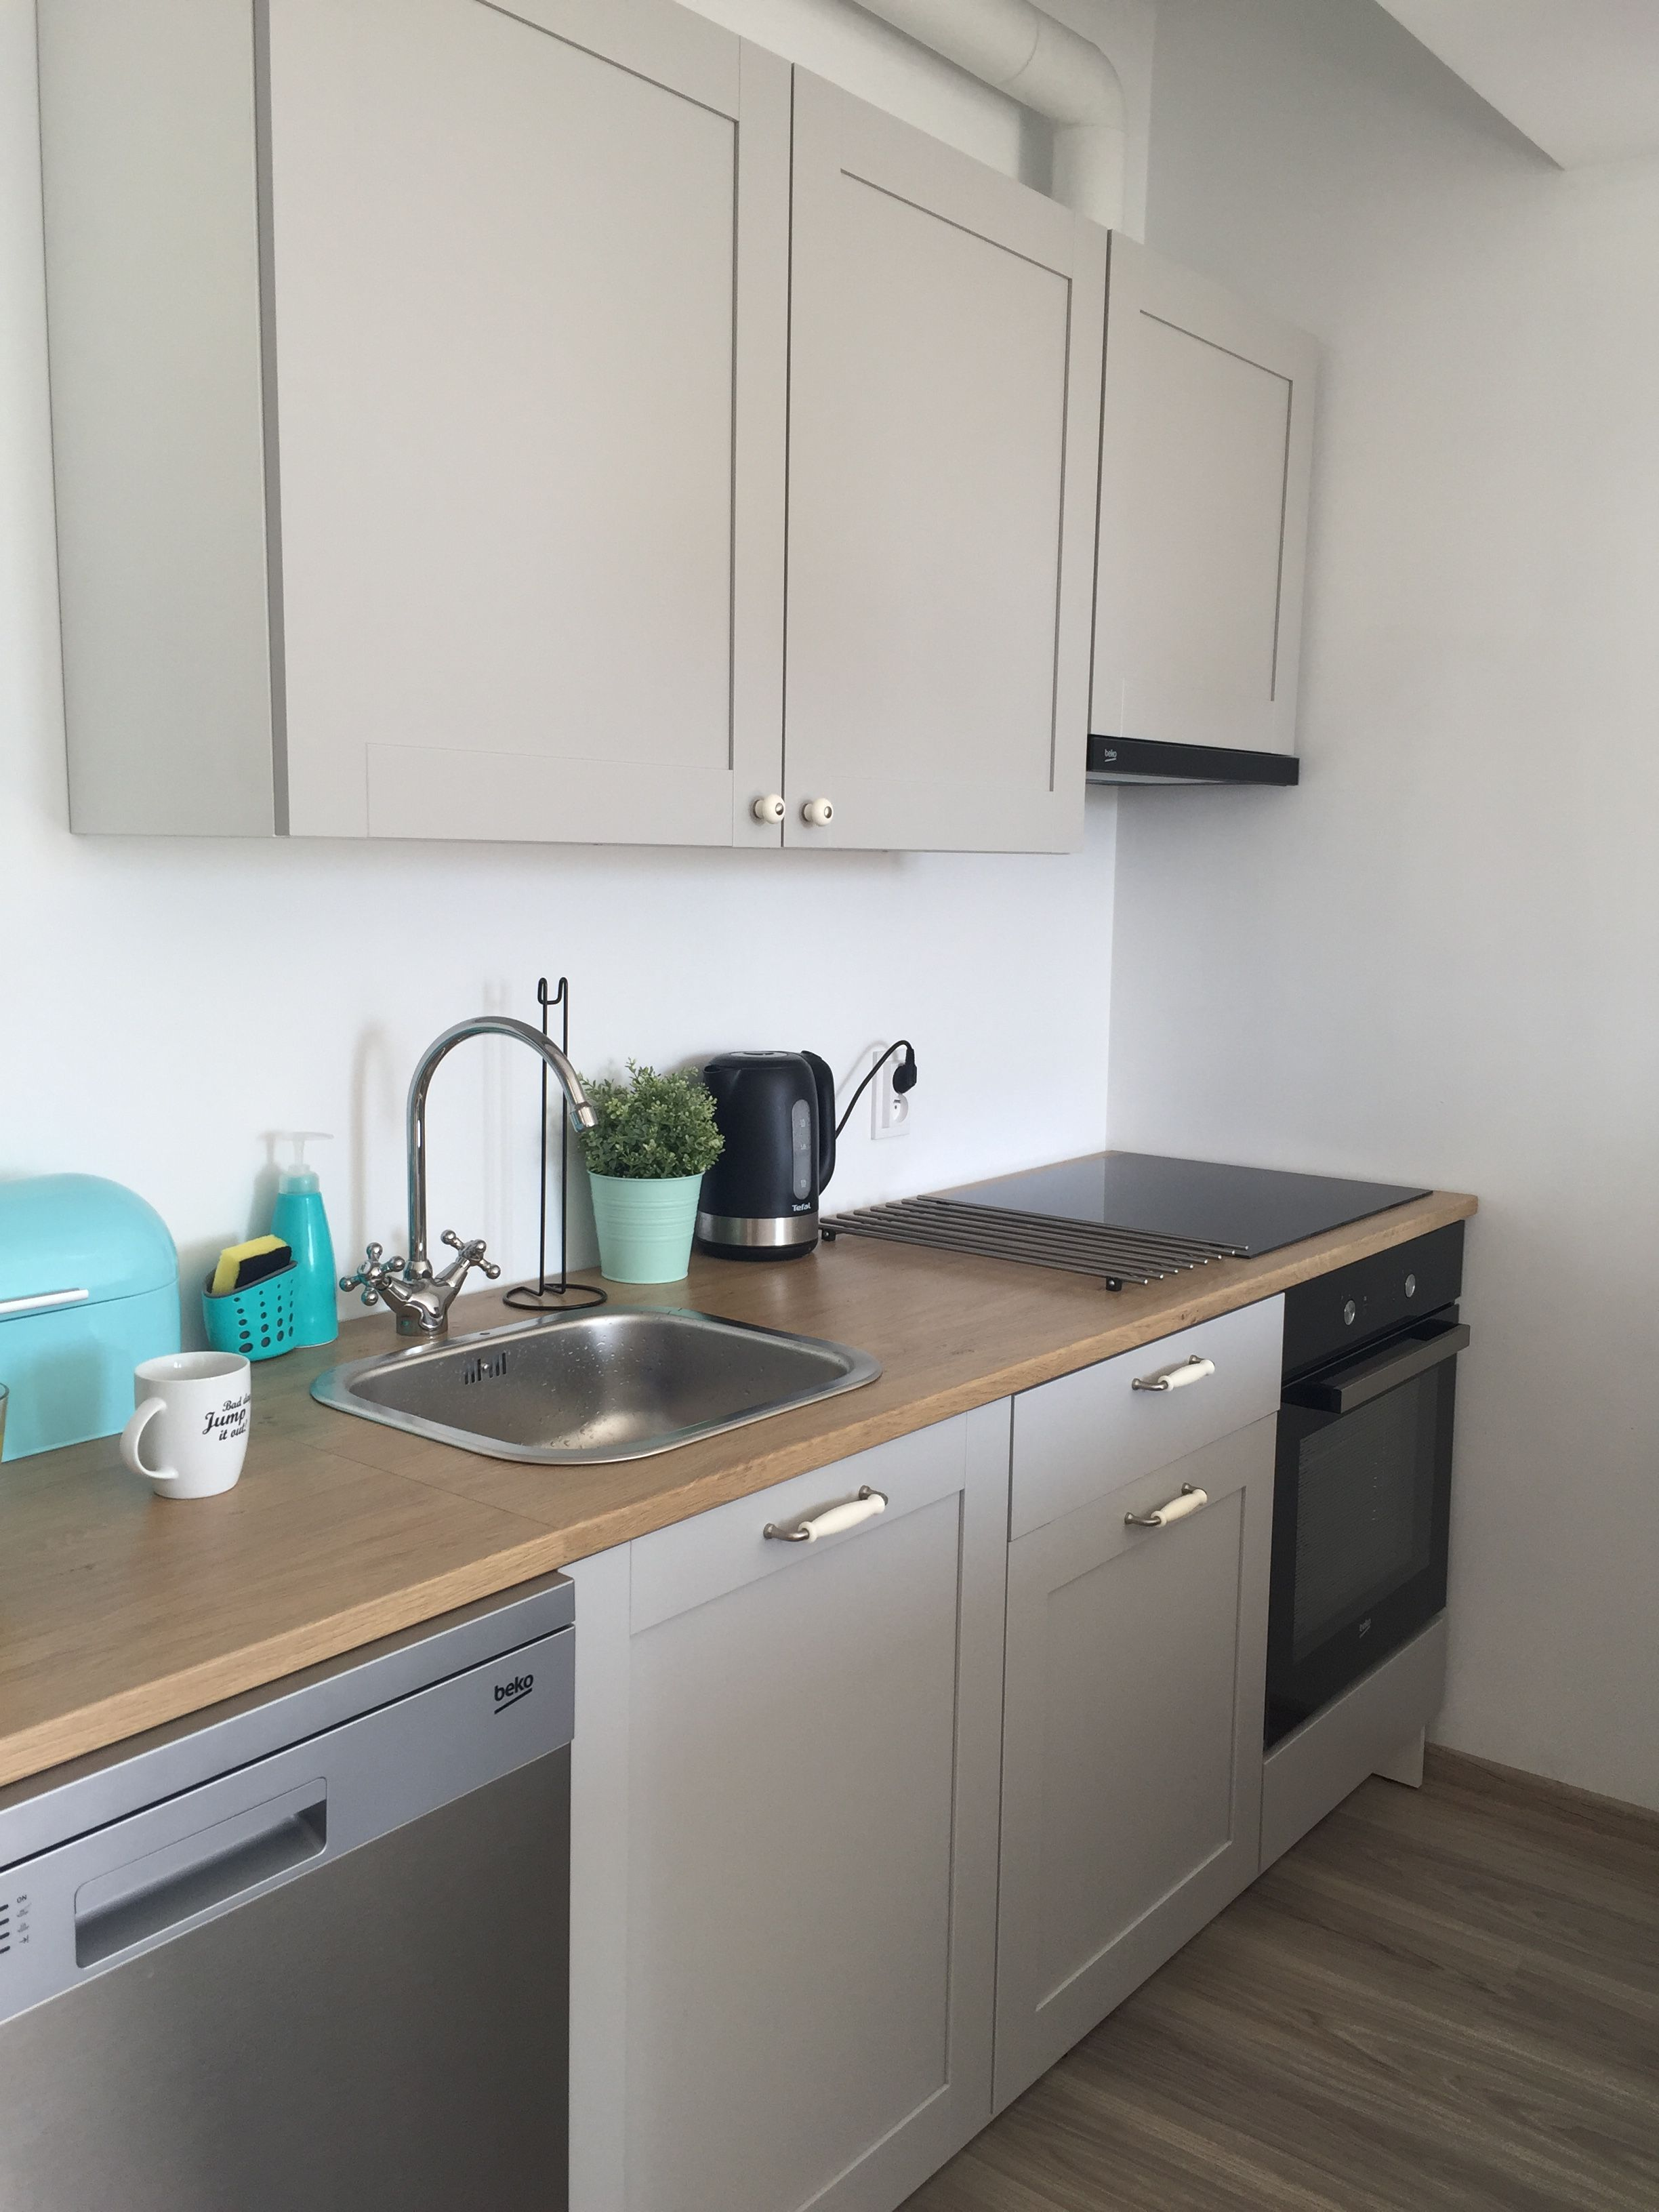 Knoxhult Ikea Grey Kitchen Kitchen Design Small Kitchen Ikea Kitchen